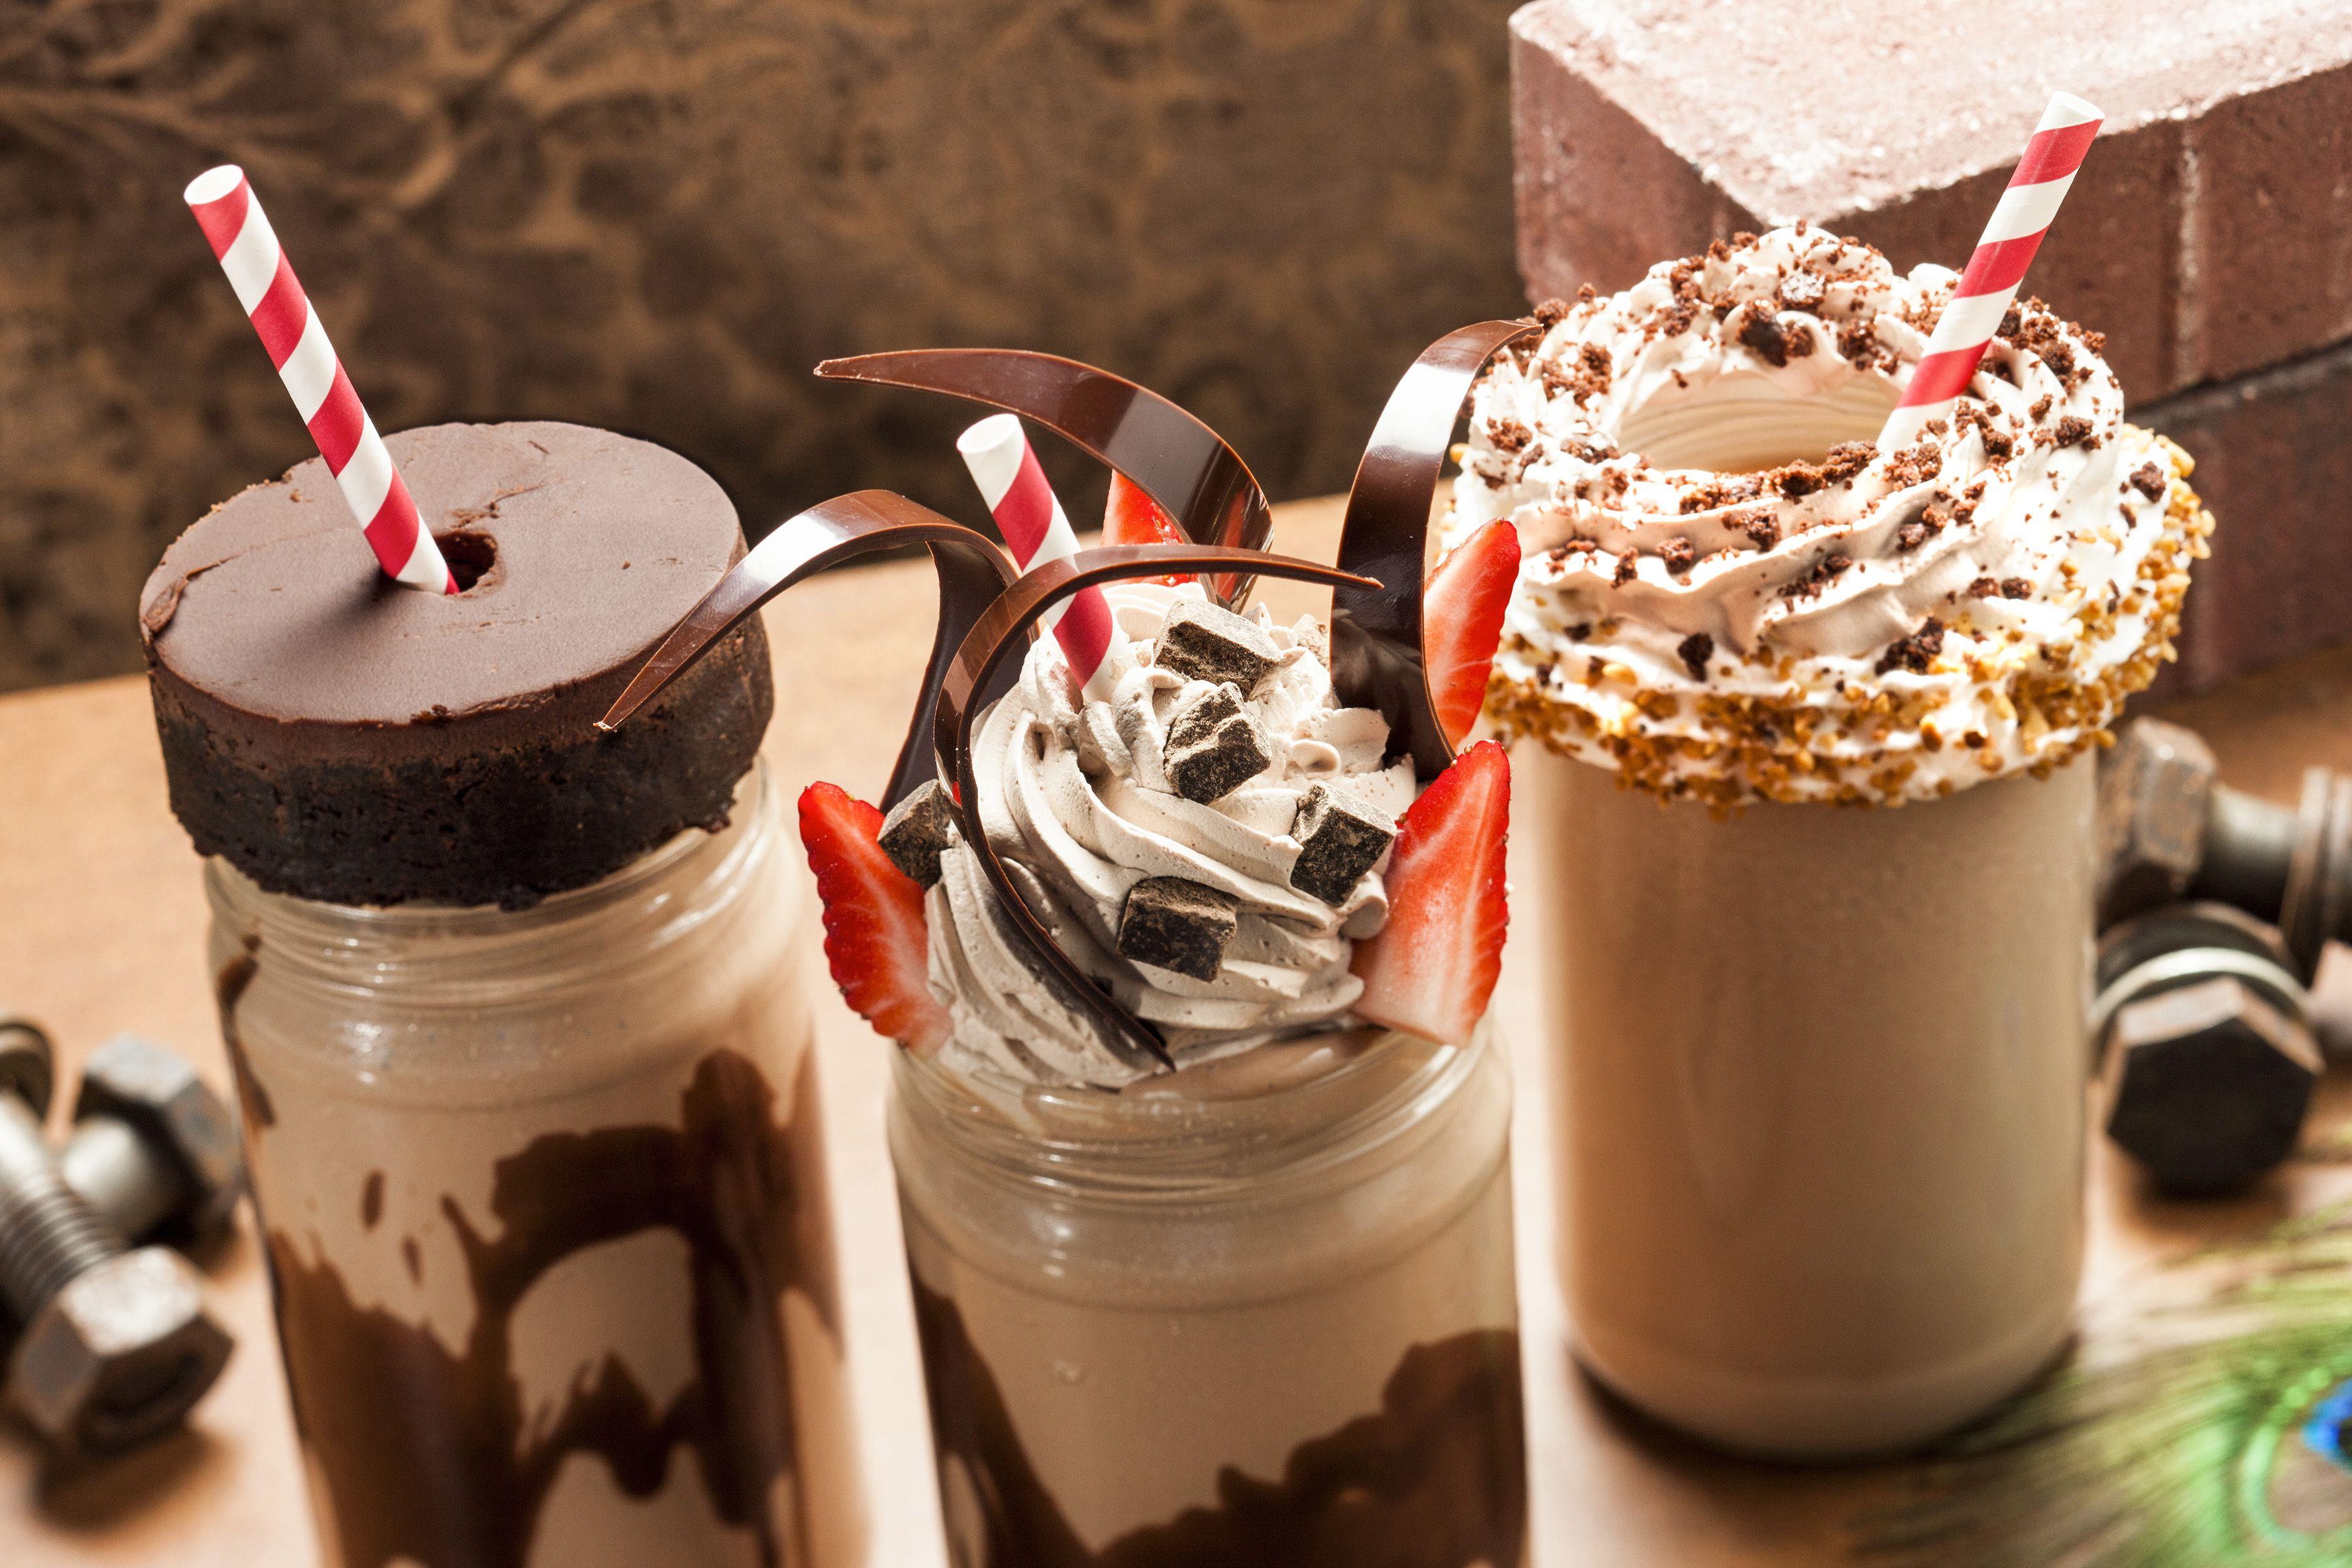 Milkshakes at The Toothsome Chocolate Emporium Universal Orlando